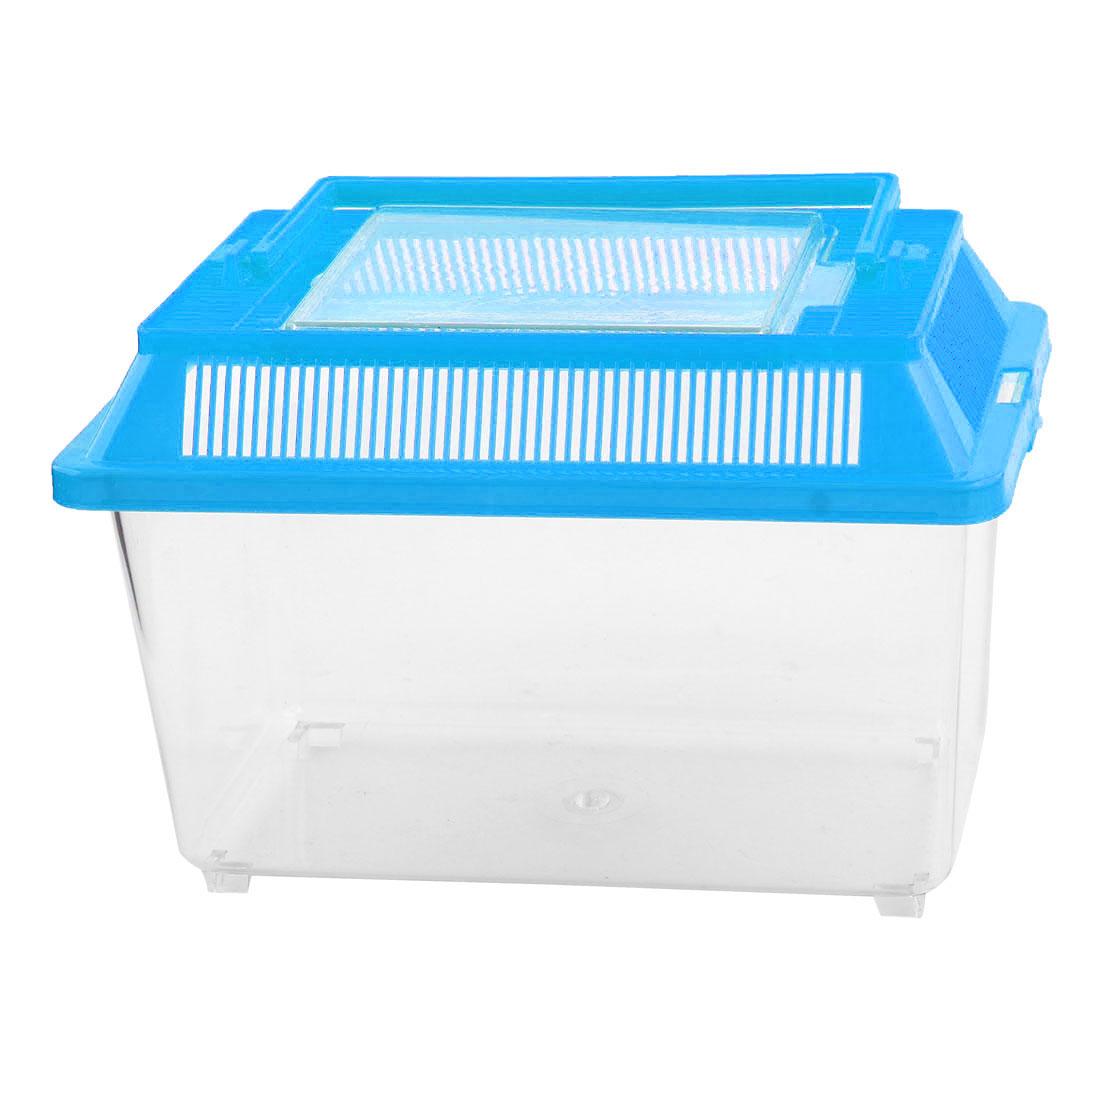 Plastic Rectangle Design Aquarium Betta Fish Tank Pet Feed Box